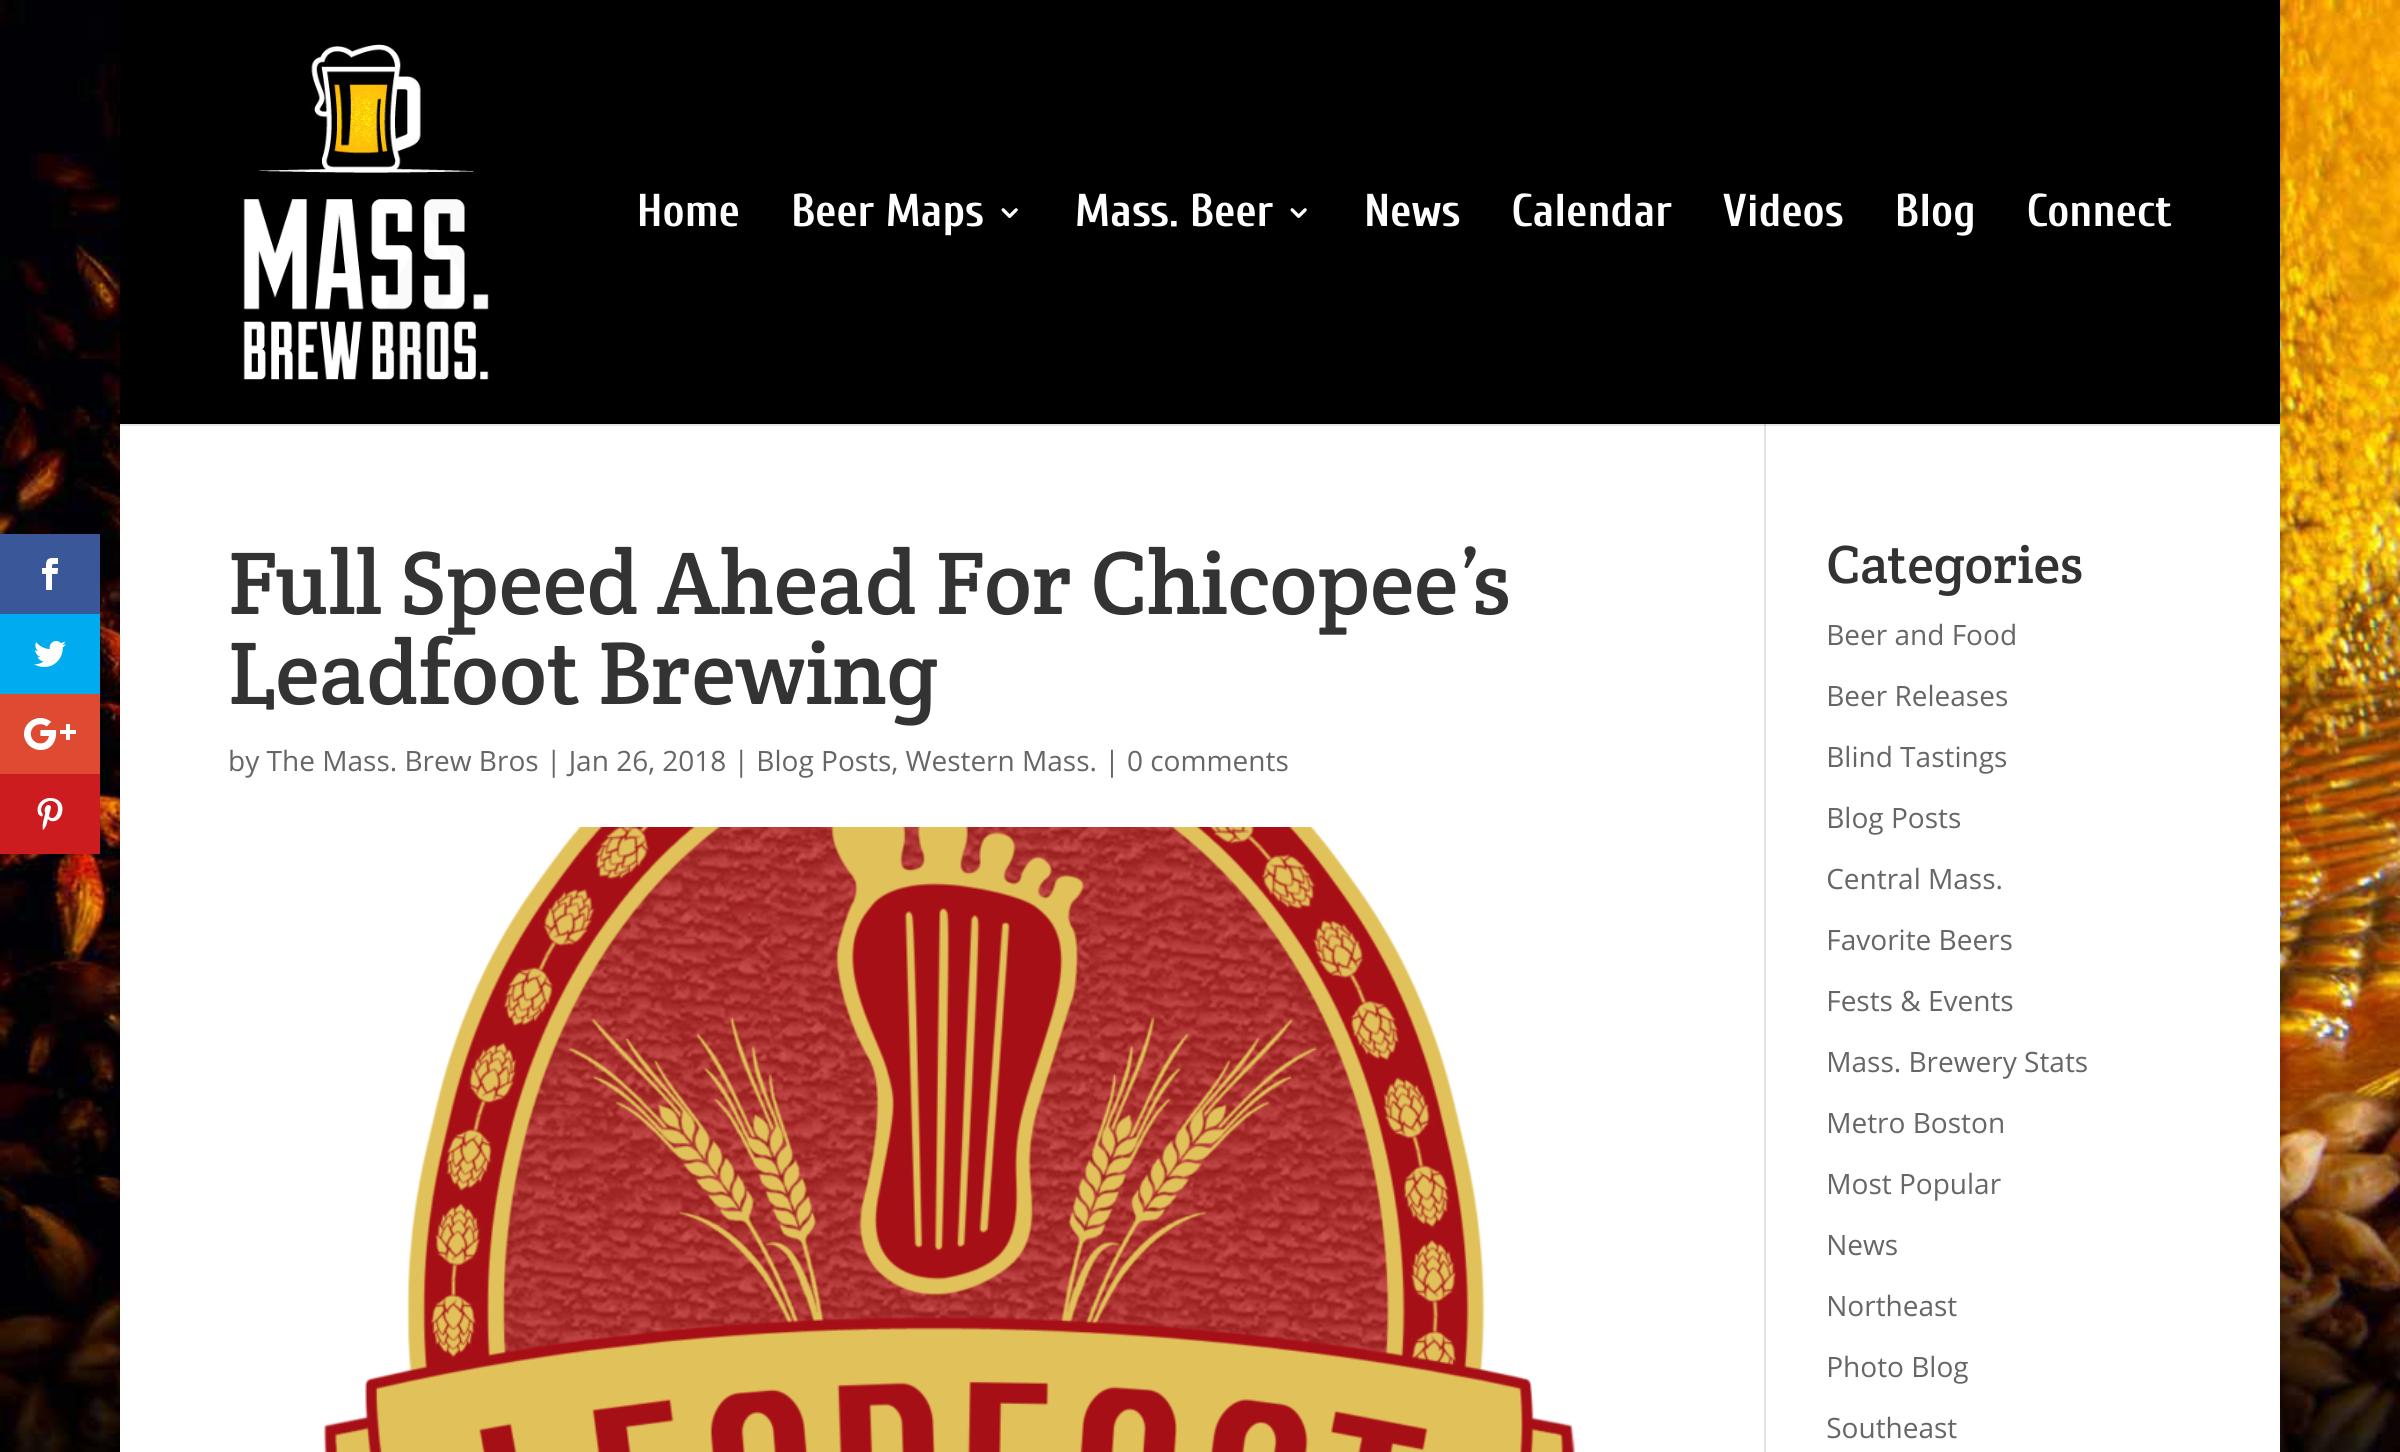 FireShot Capture 4 - Full Speed Ahead For Chicopee's Leadfo_ - http___massbrewbros.com_full-speed-.png